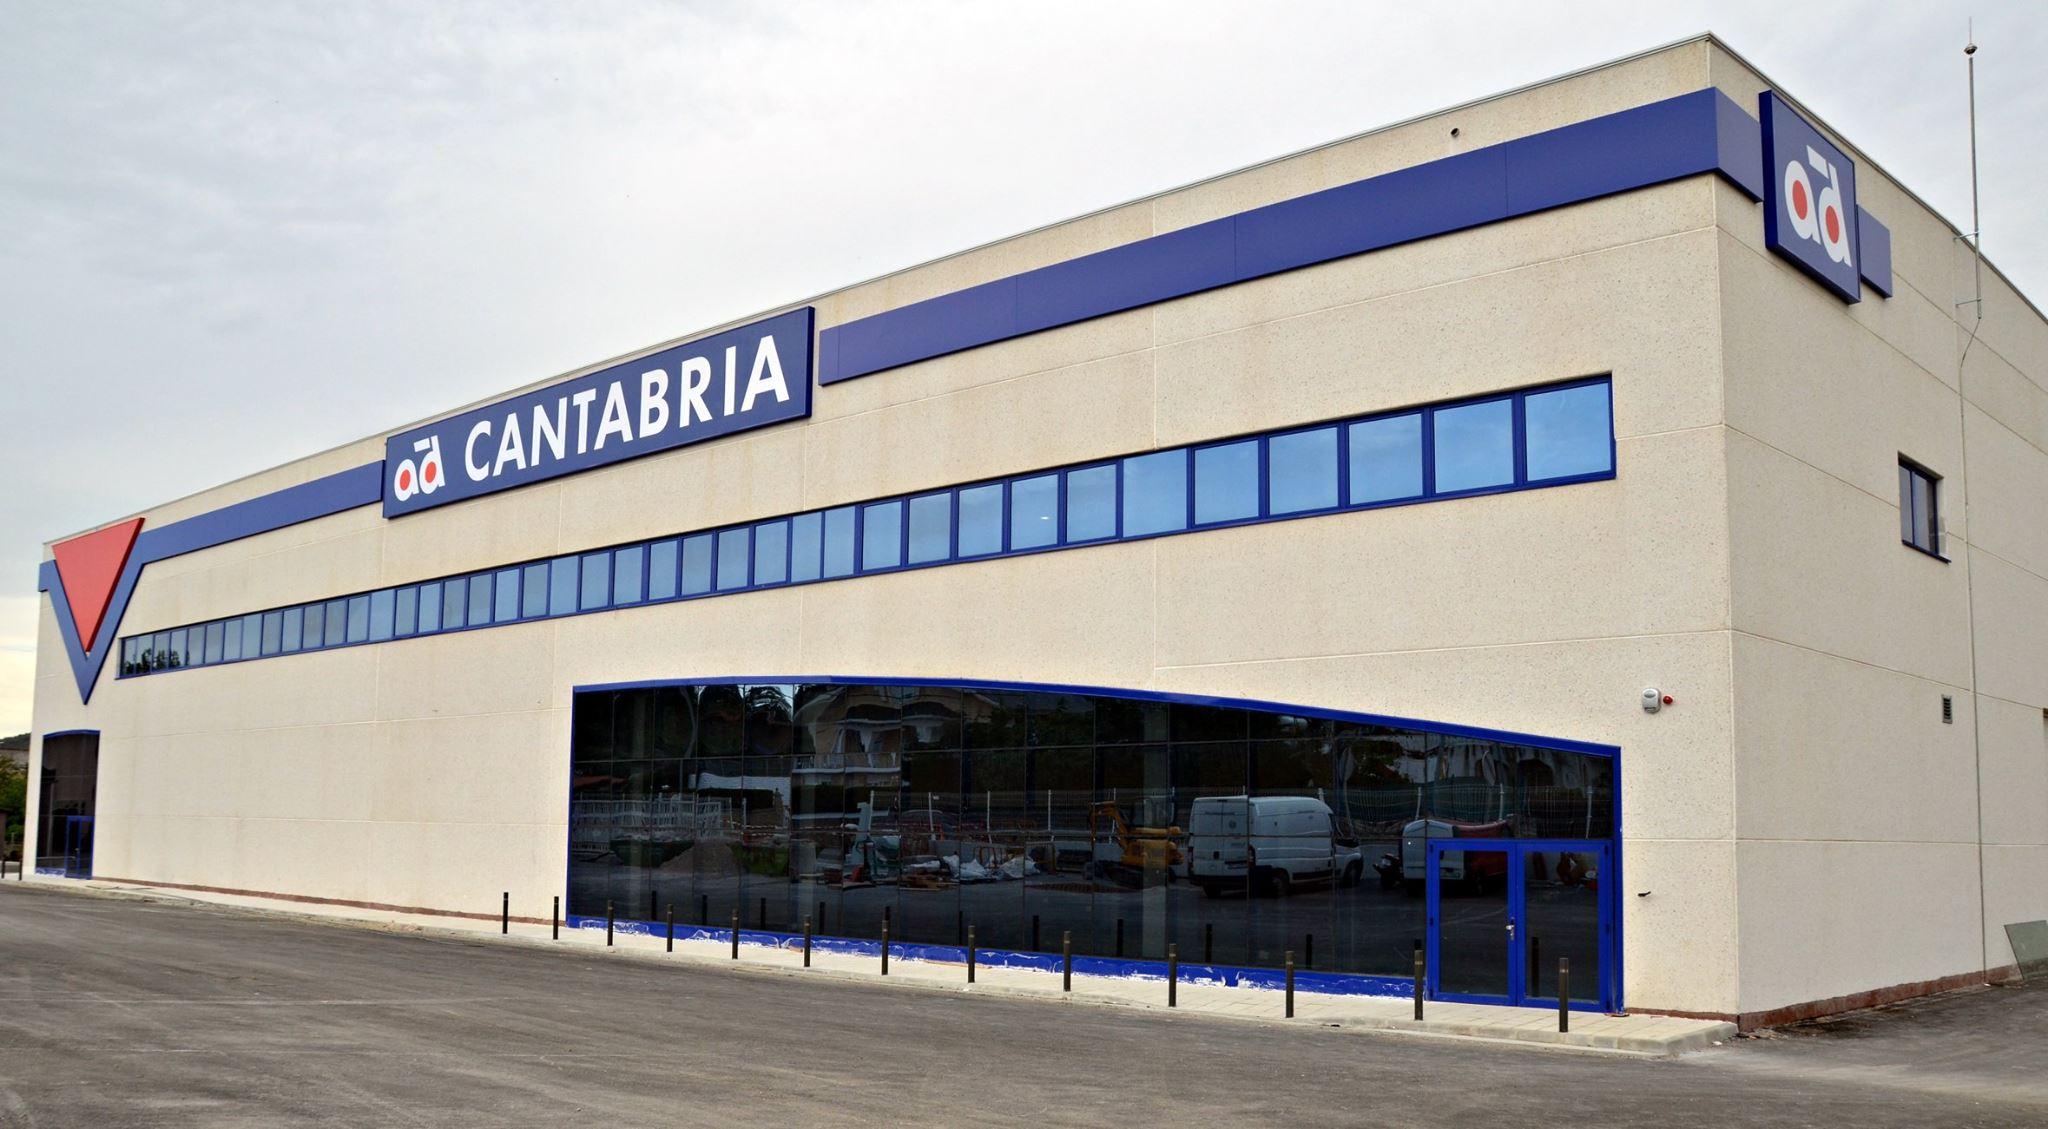 AD Cantabria